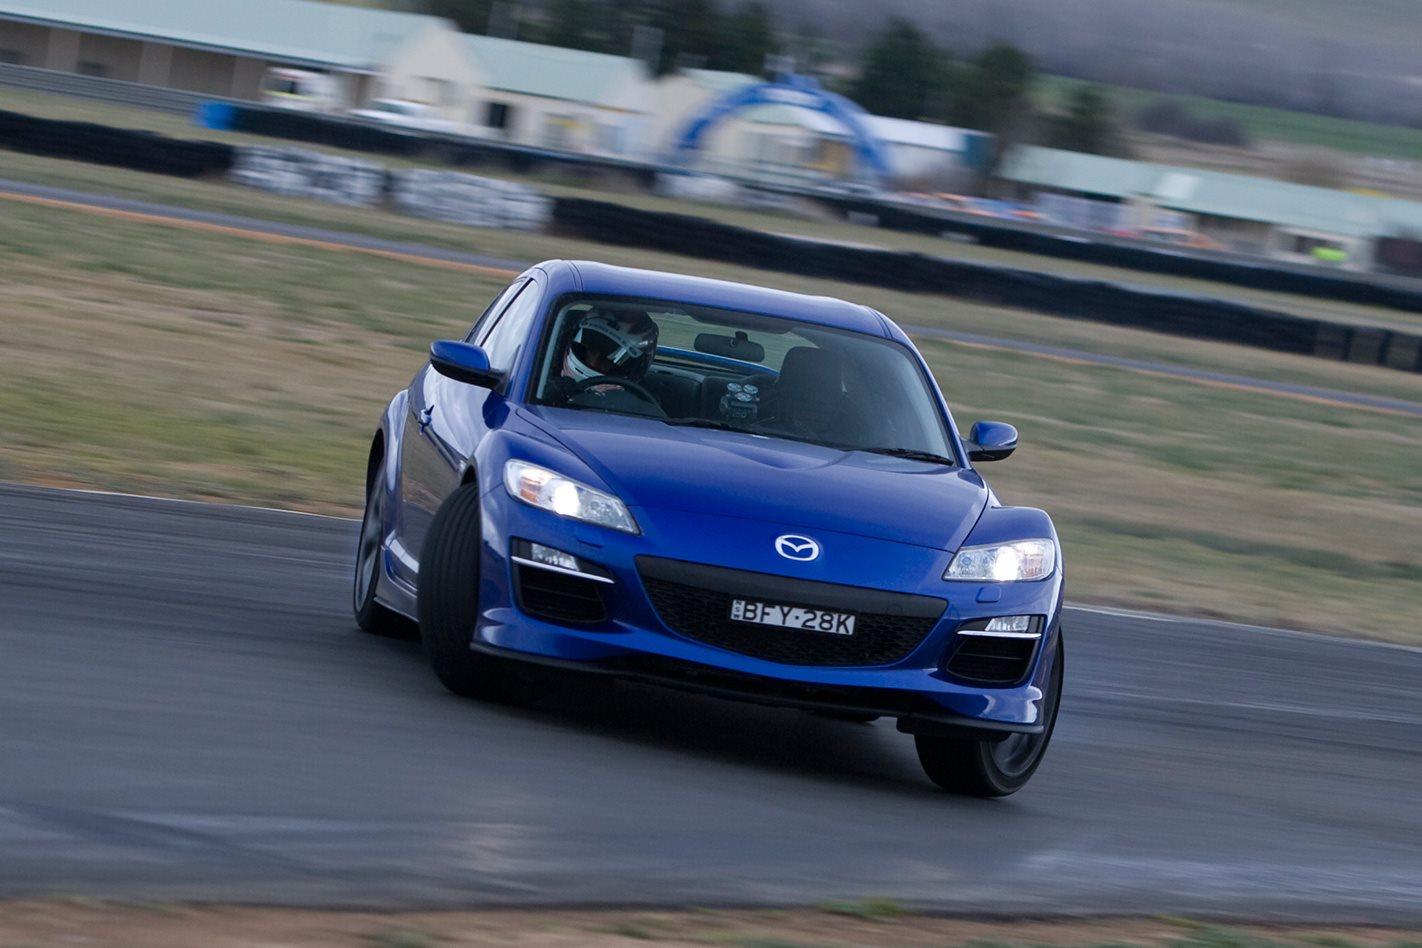 2008-Mazda-RX-8-GT-drifting.jpg